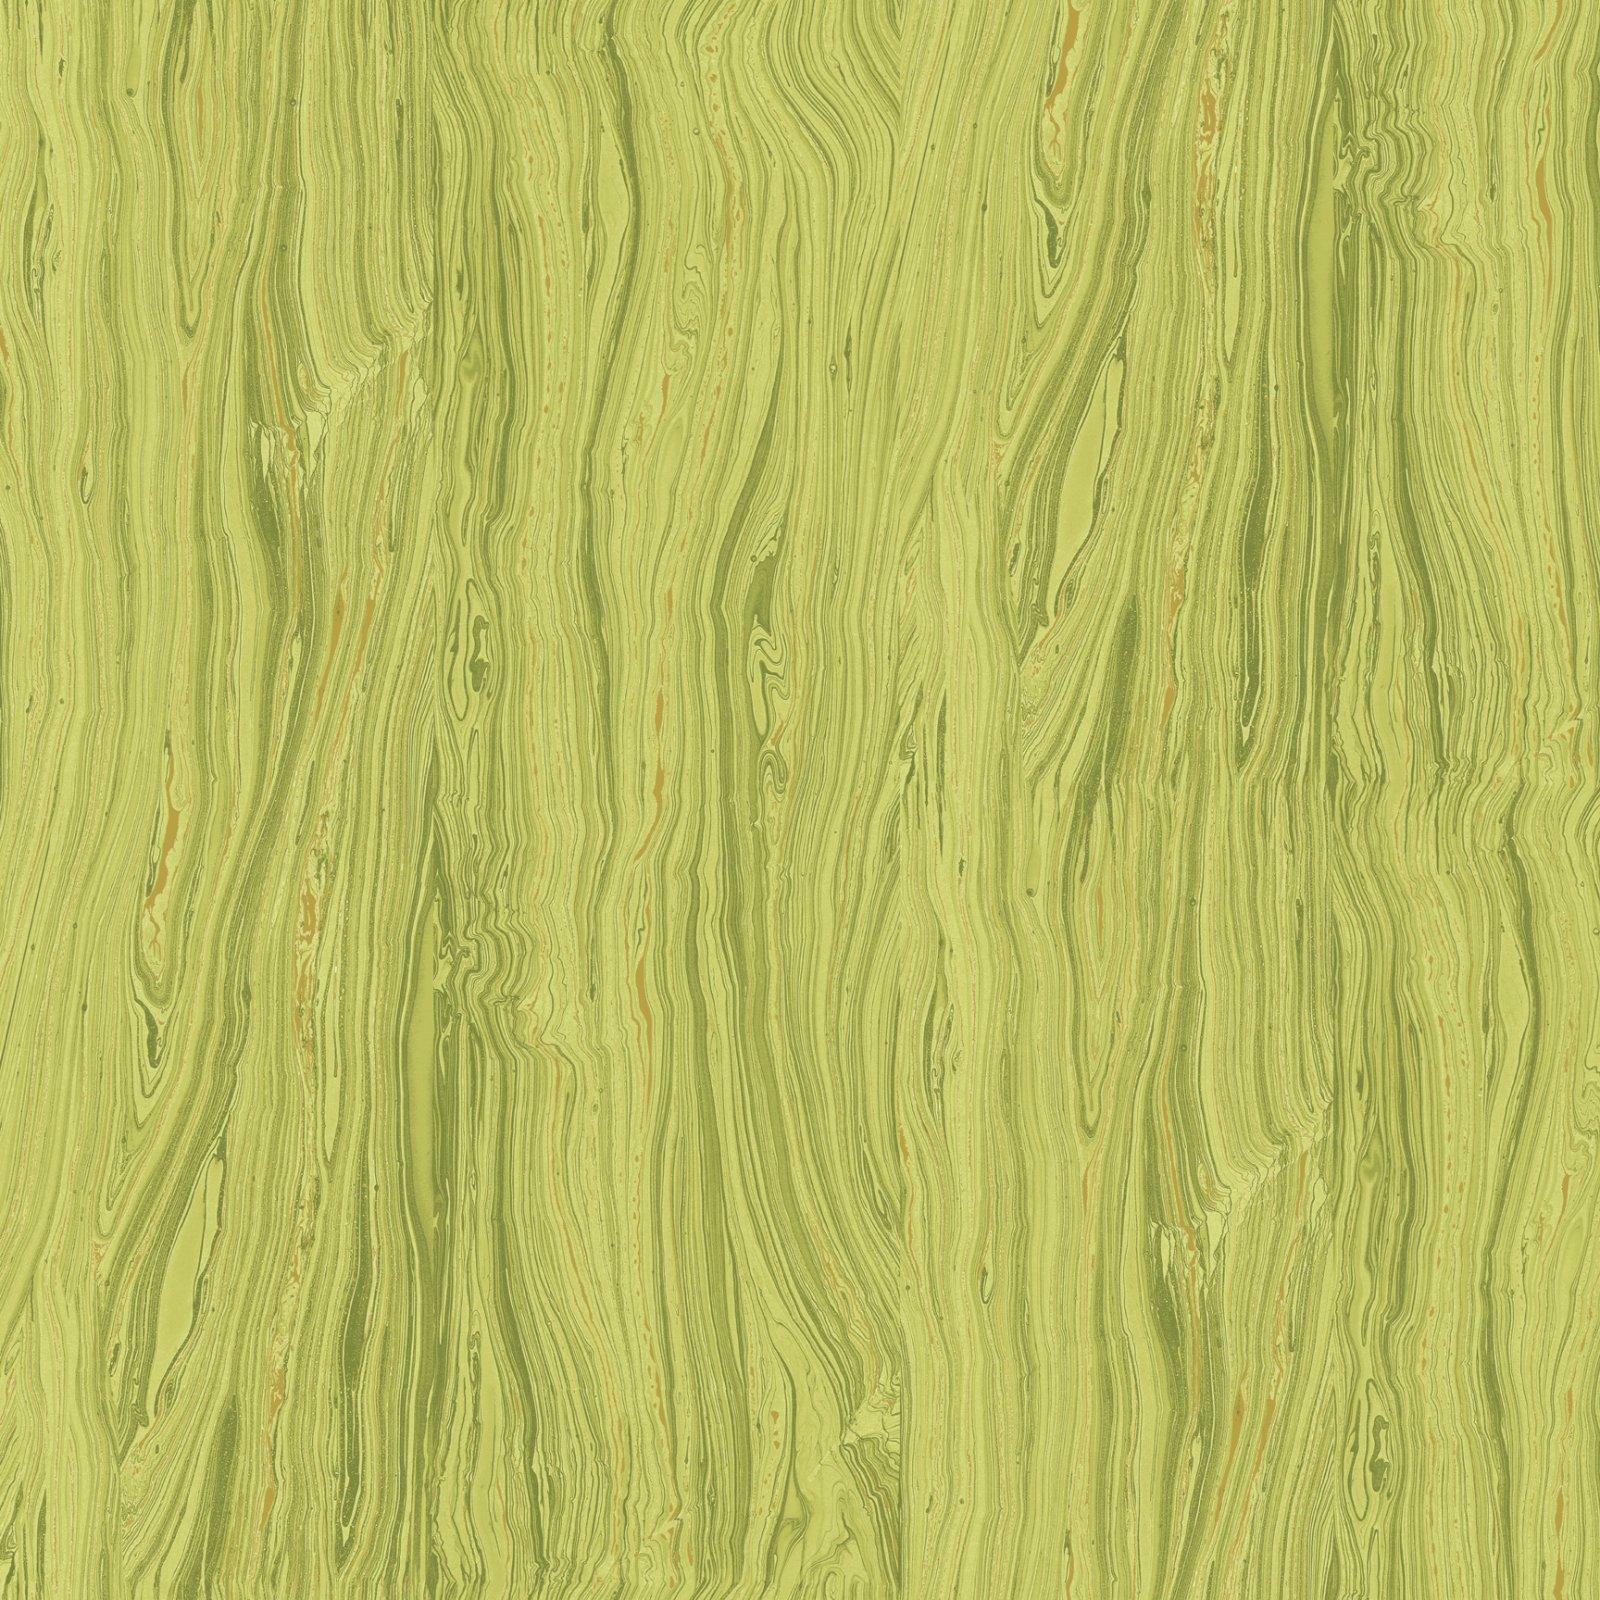 Sandscapes Moss